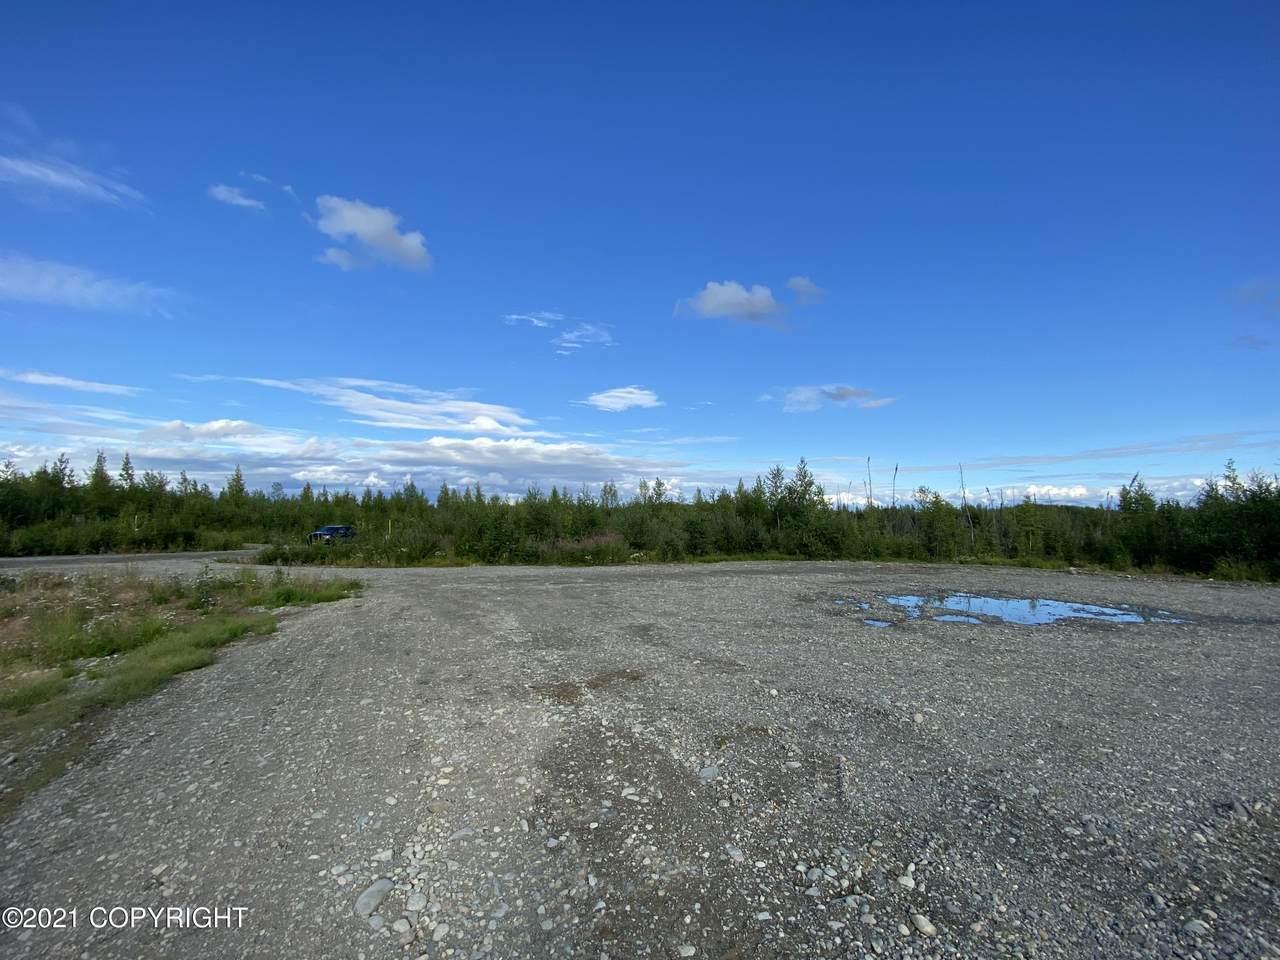 https://bt-photos.global.ssl.fastly.net/alaska/1280_boomver_4_21-13098-2.jpg